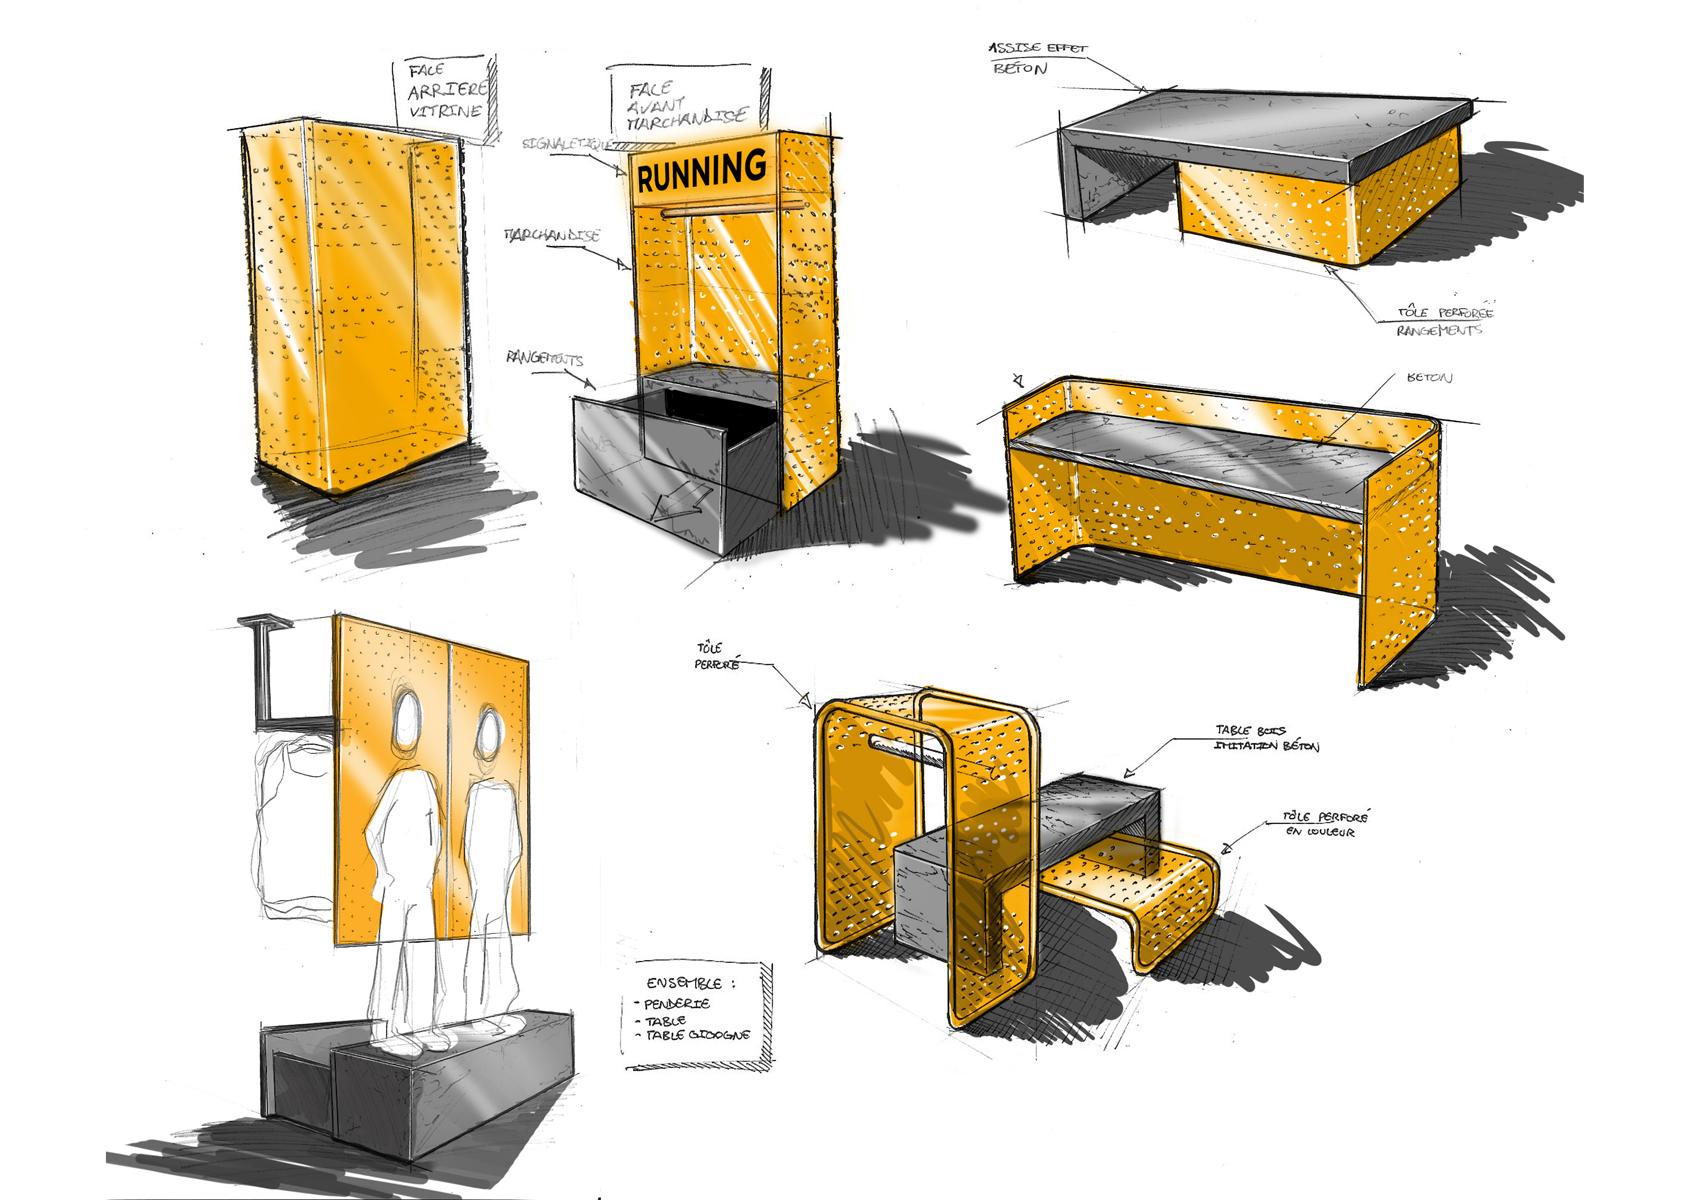 Magasin de sport for Replique mobilier design